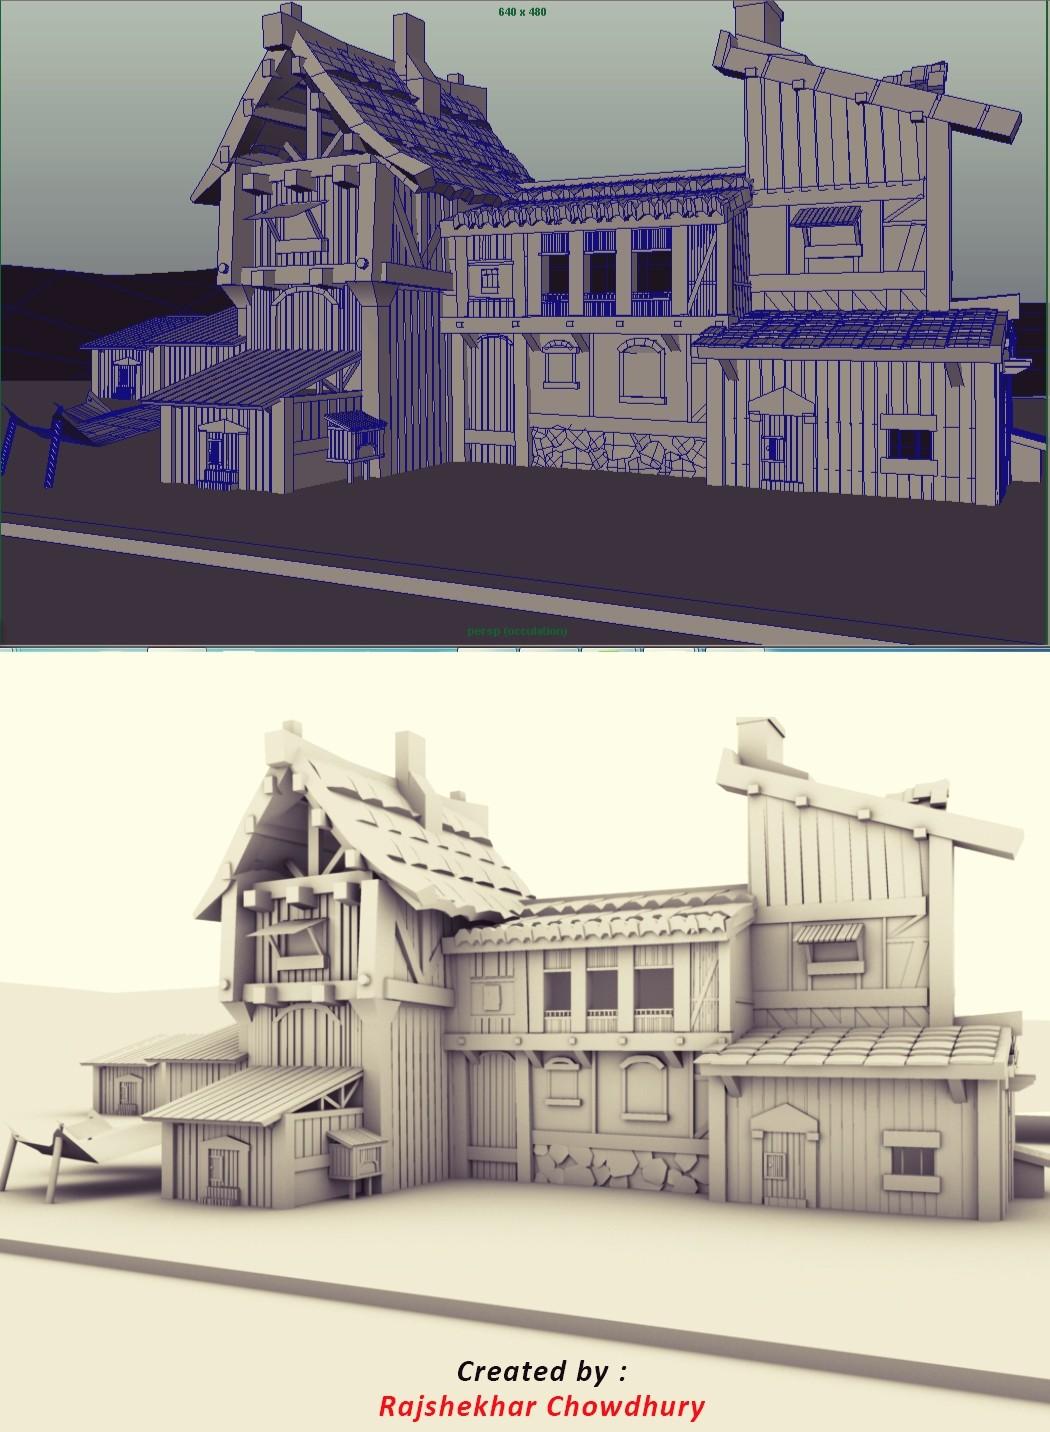 Swell Artstation Digital And 3D Artwork Done By Rajshekhar Download Free Architecture Designs Sospemadebymaigaardcom